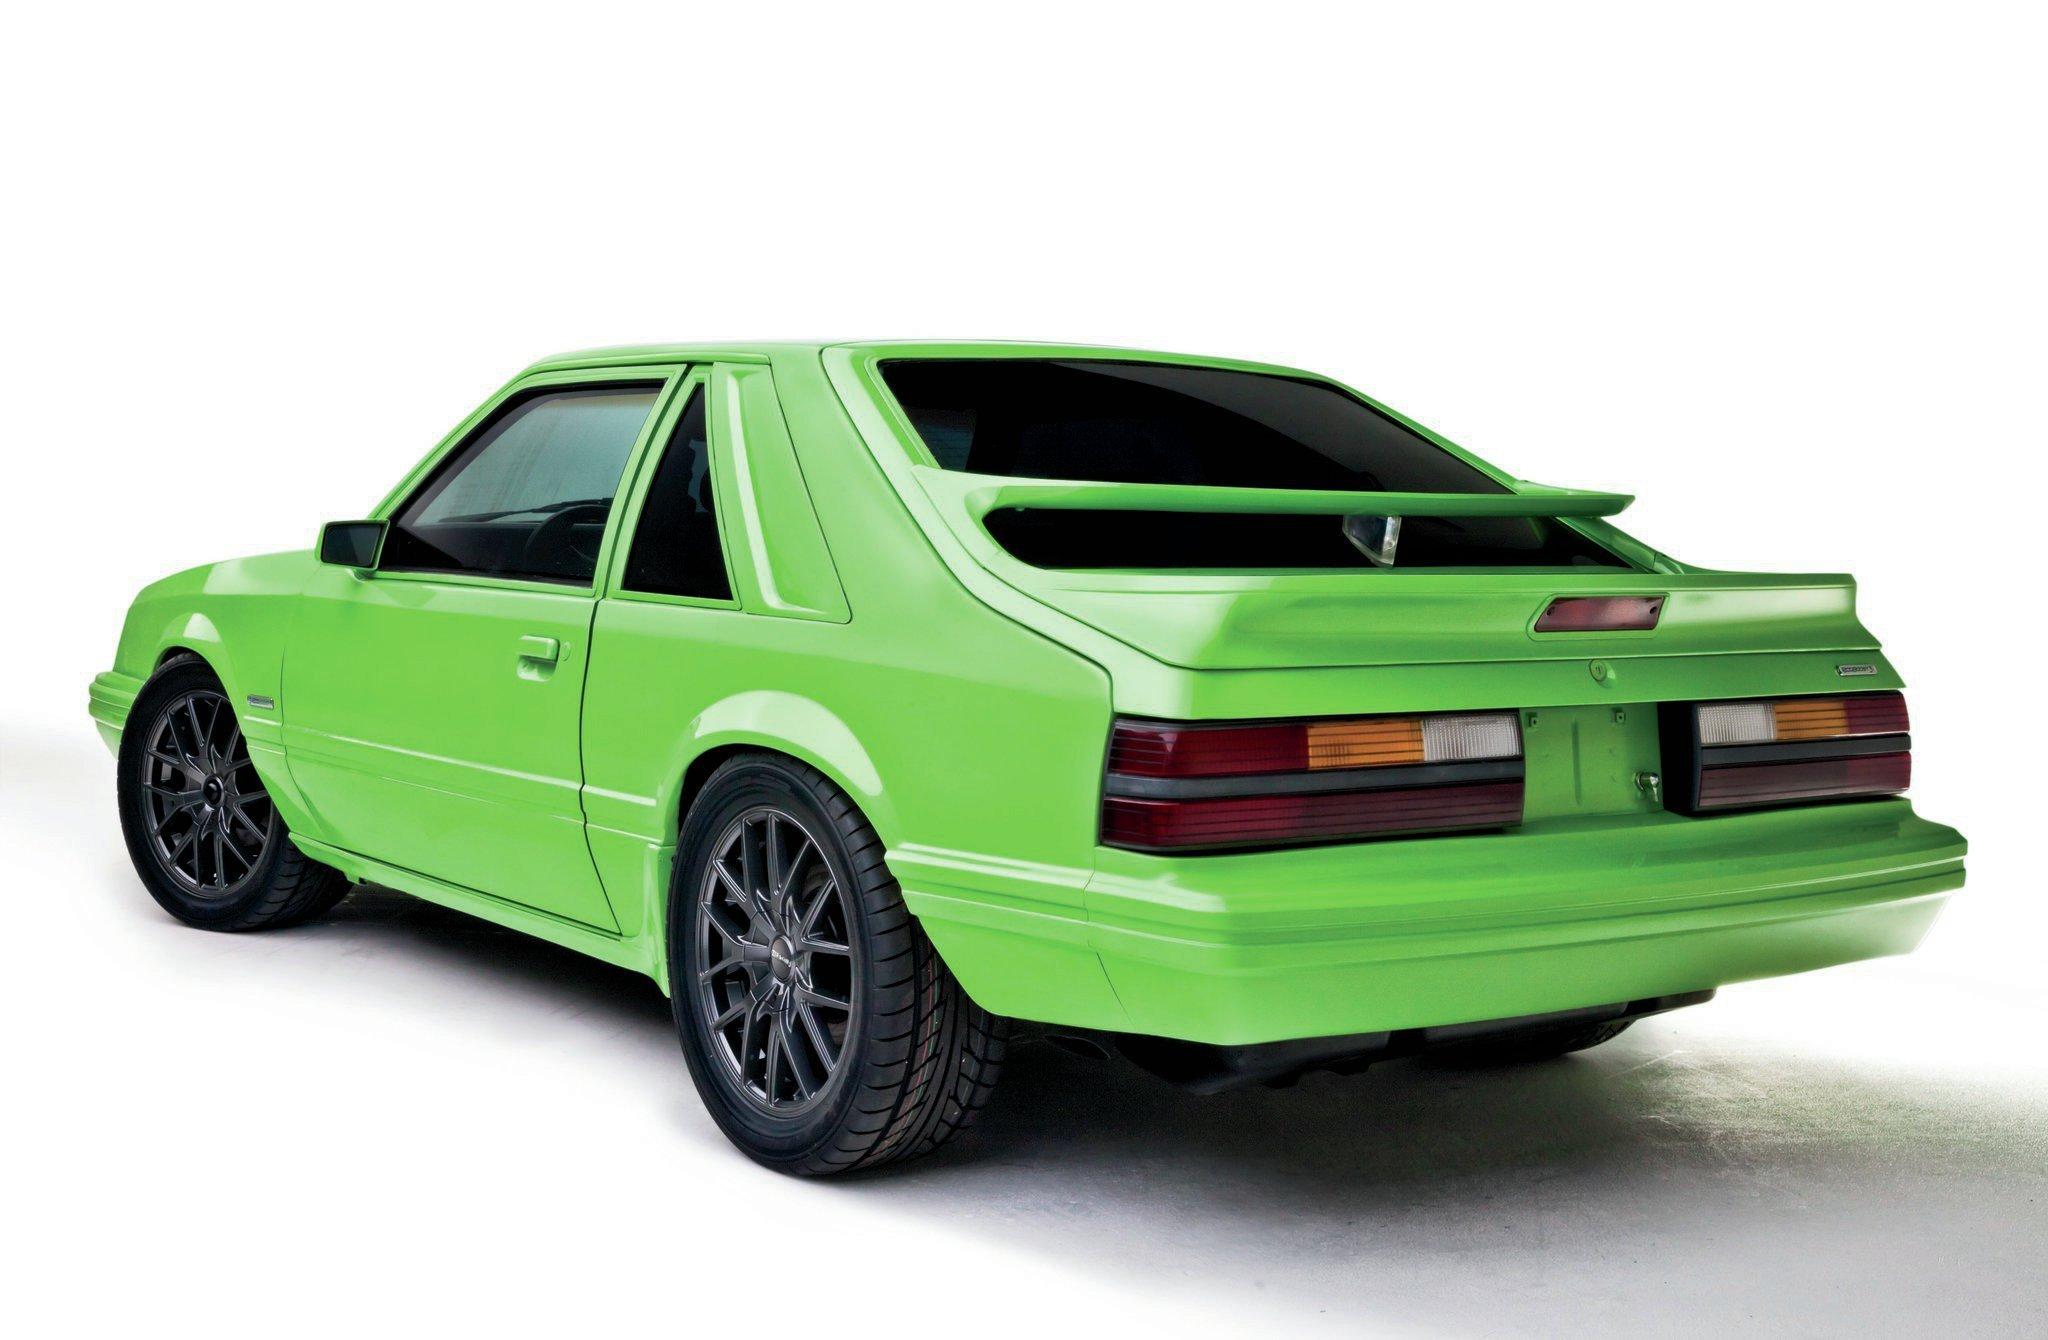 1986 Ford Mustang Gt Pro Touring Super Street Rod Rodder Hot Muscle Usa 2048x1360 08 Wallpaper 2048x1340 677217 Wallpaperup